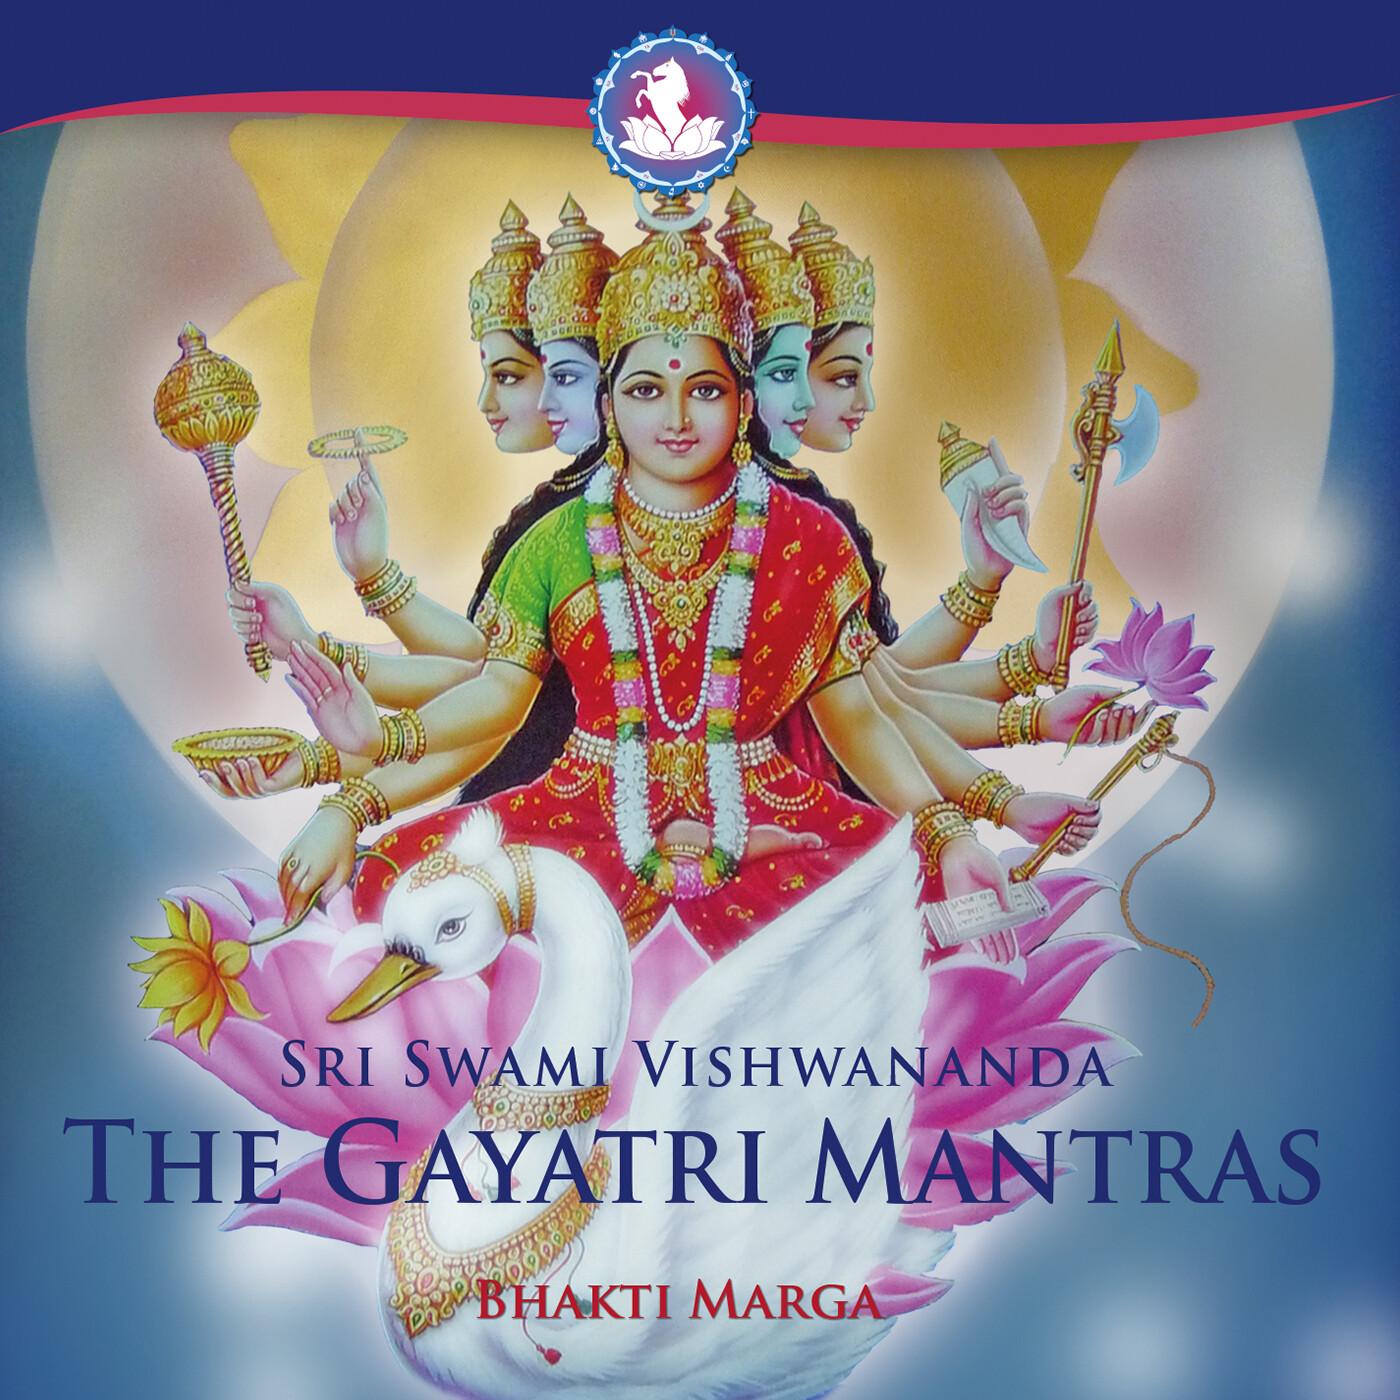 The Gayatri Mantras - Sri Swami Vishwananda